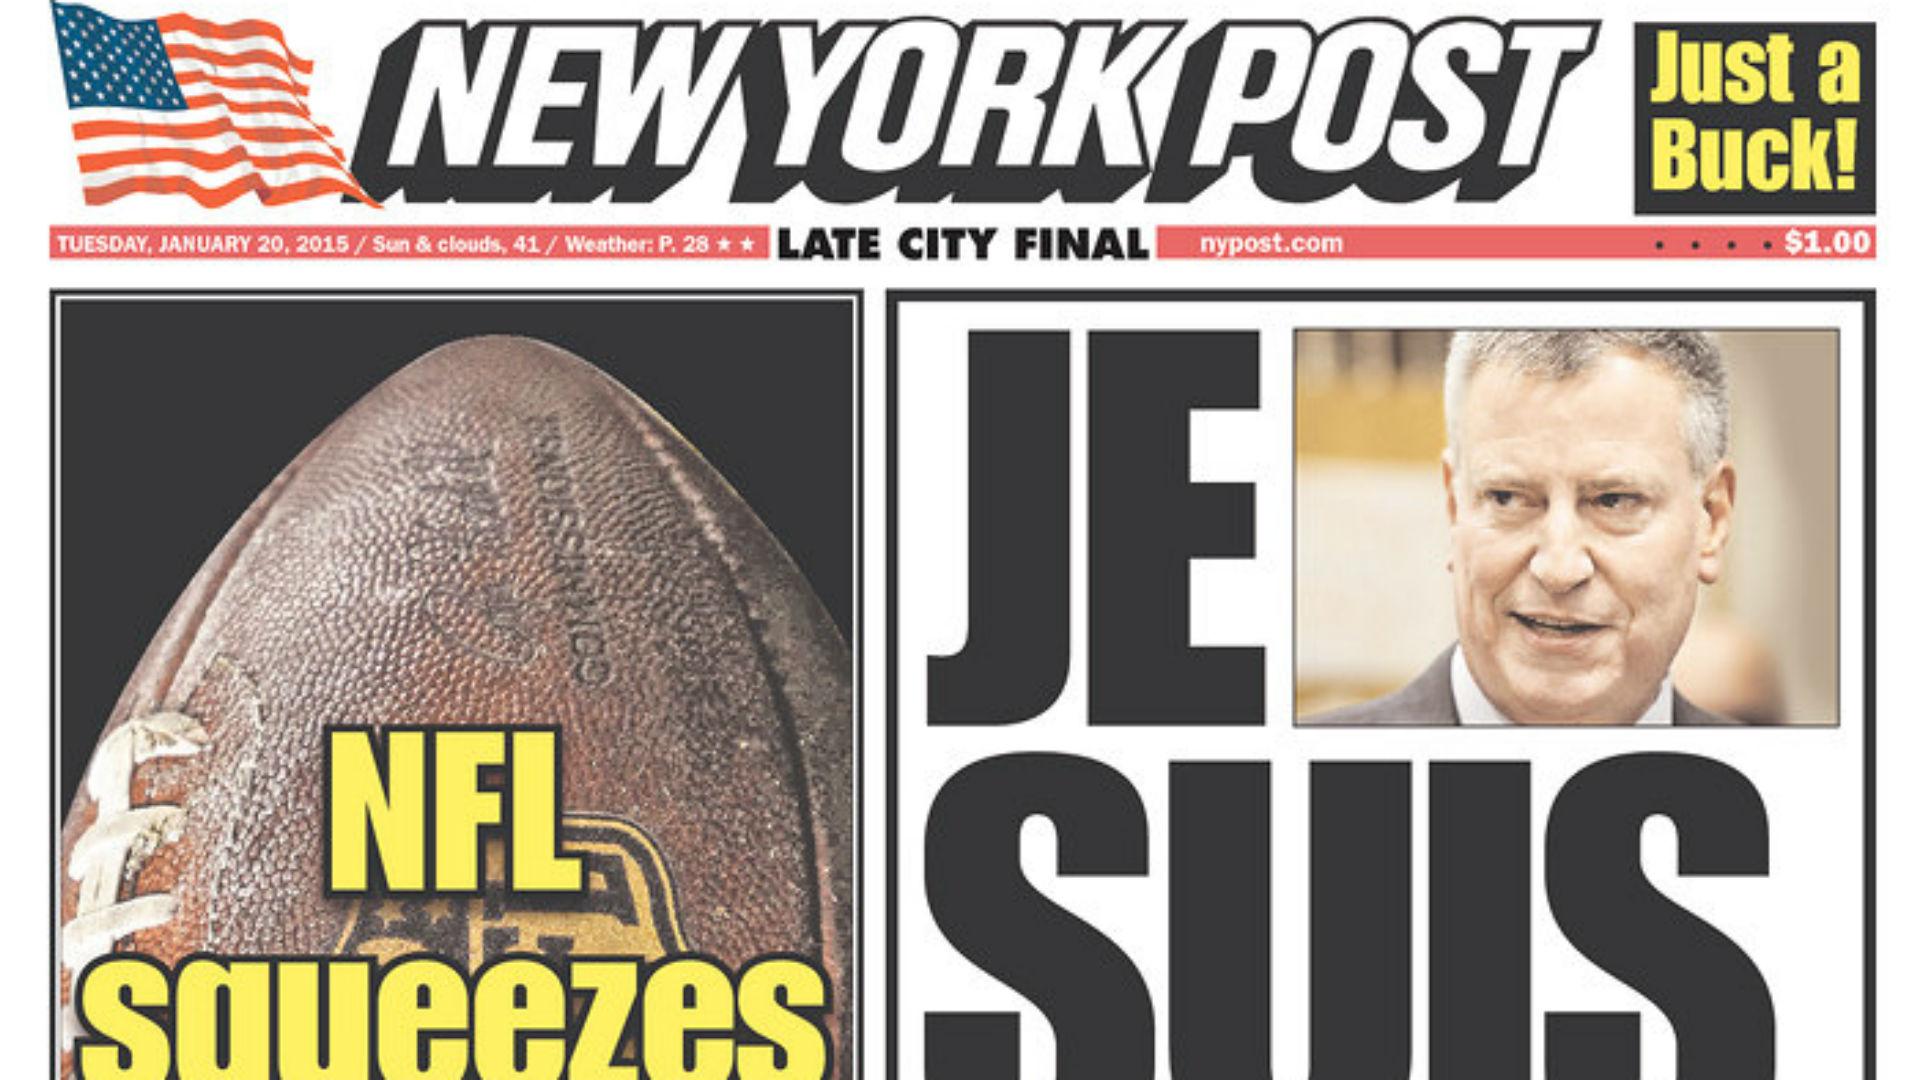 Deflate Gate inspires New York Post's headline pun